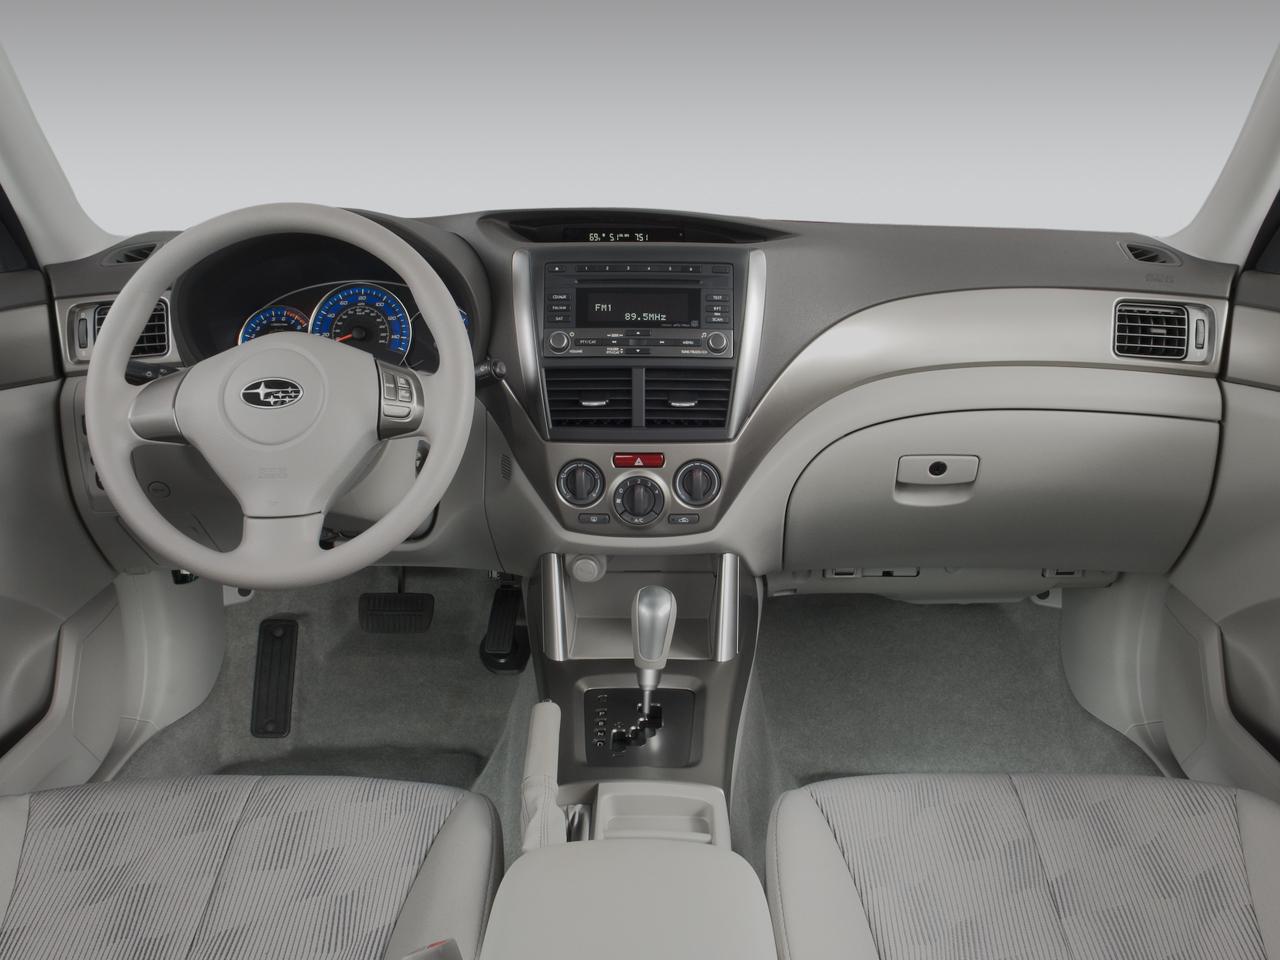 2009 Subaru Forester Xt Interior Www Indiepedia Org